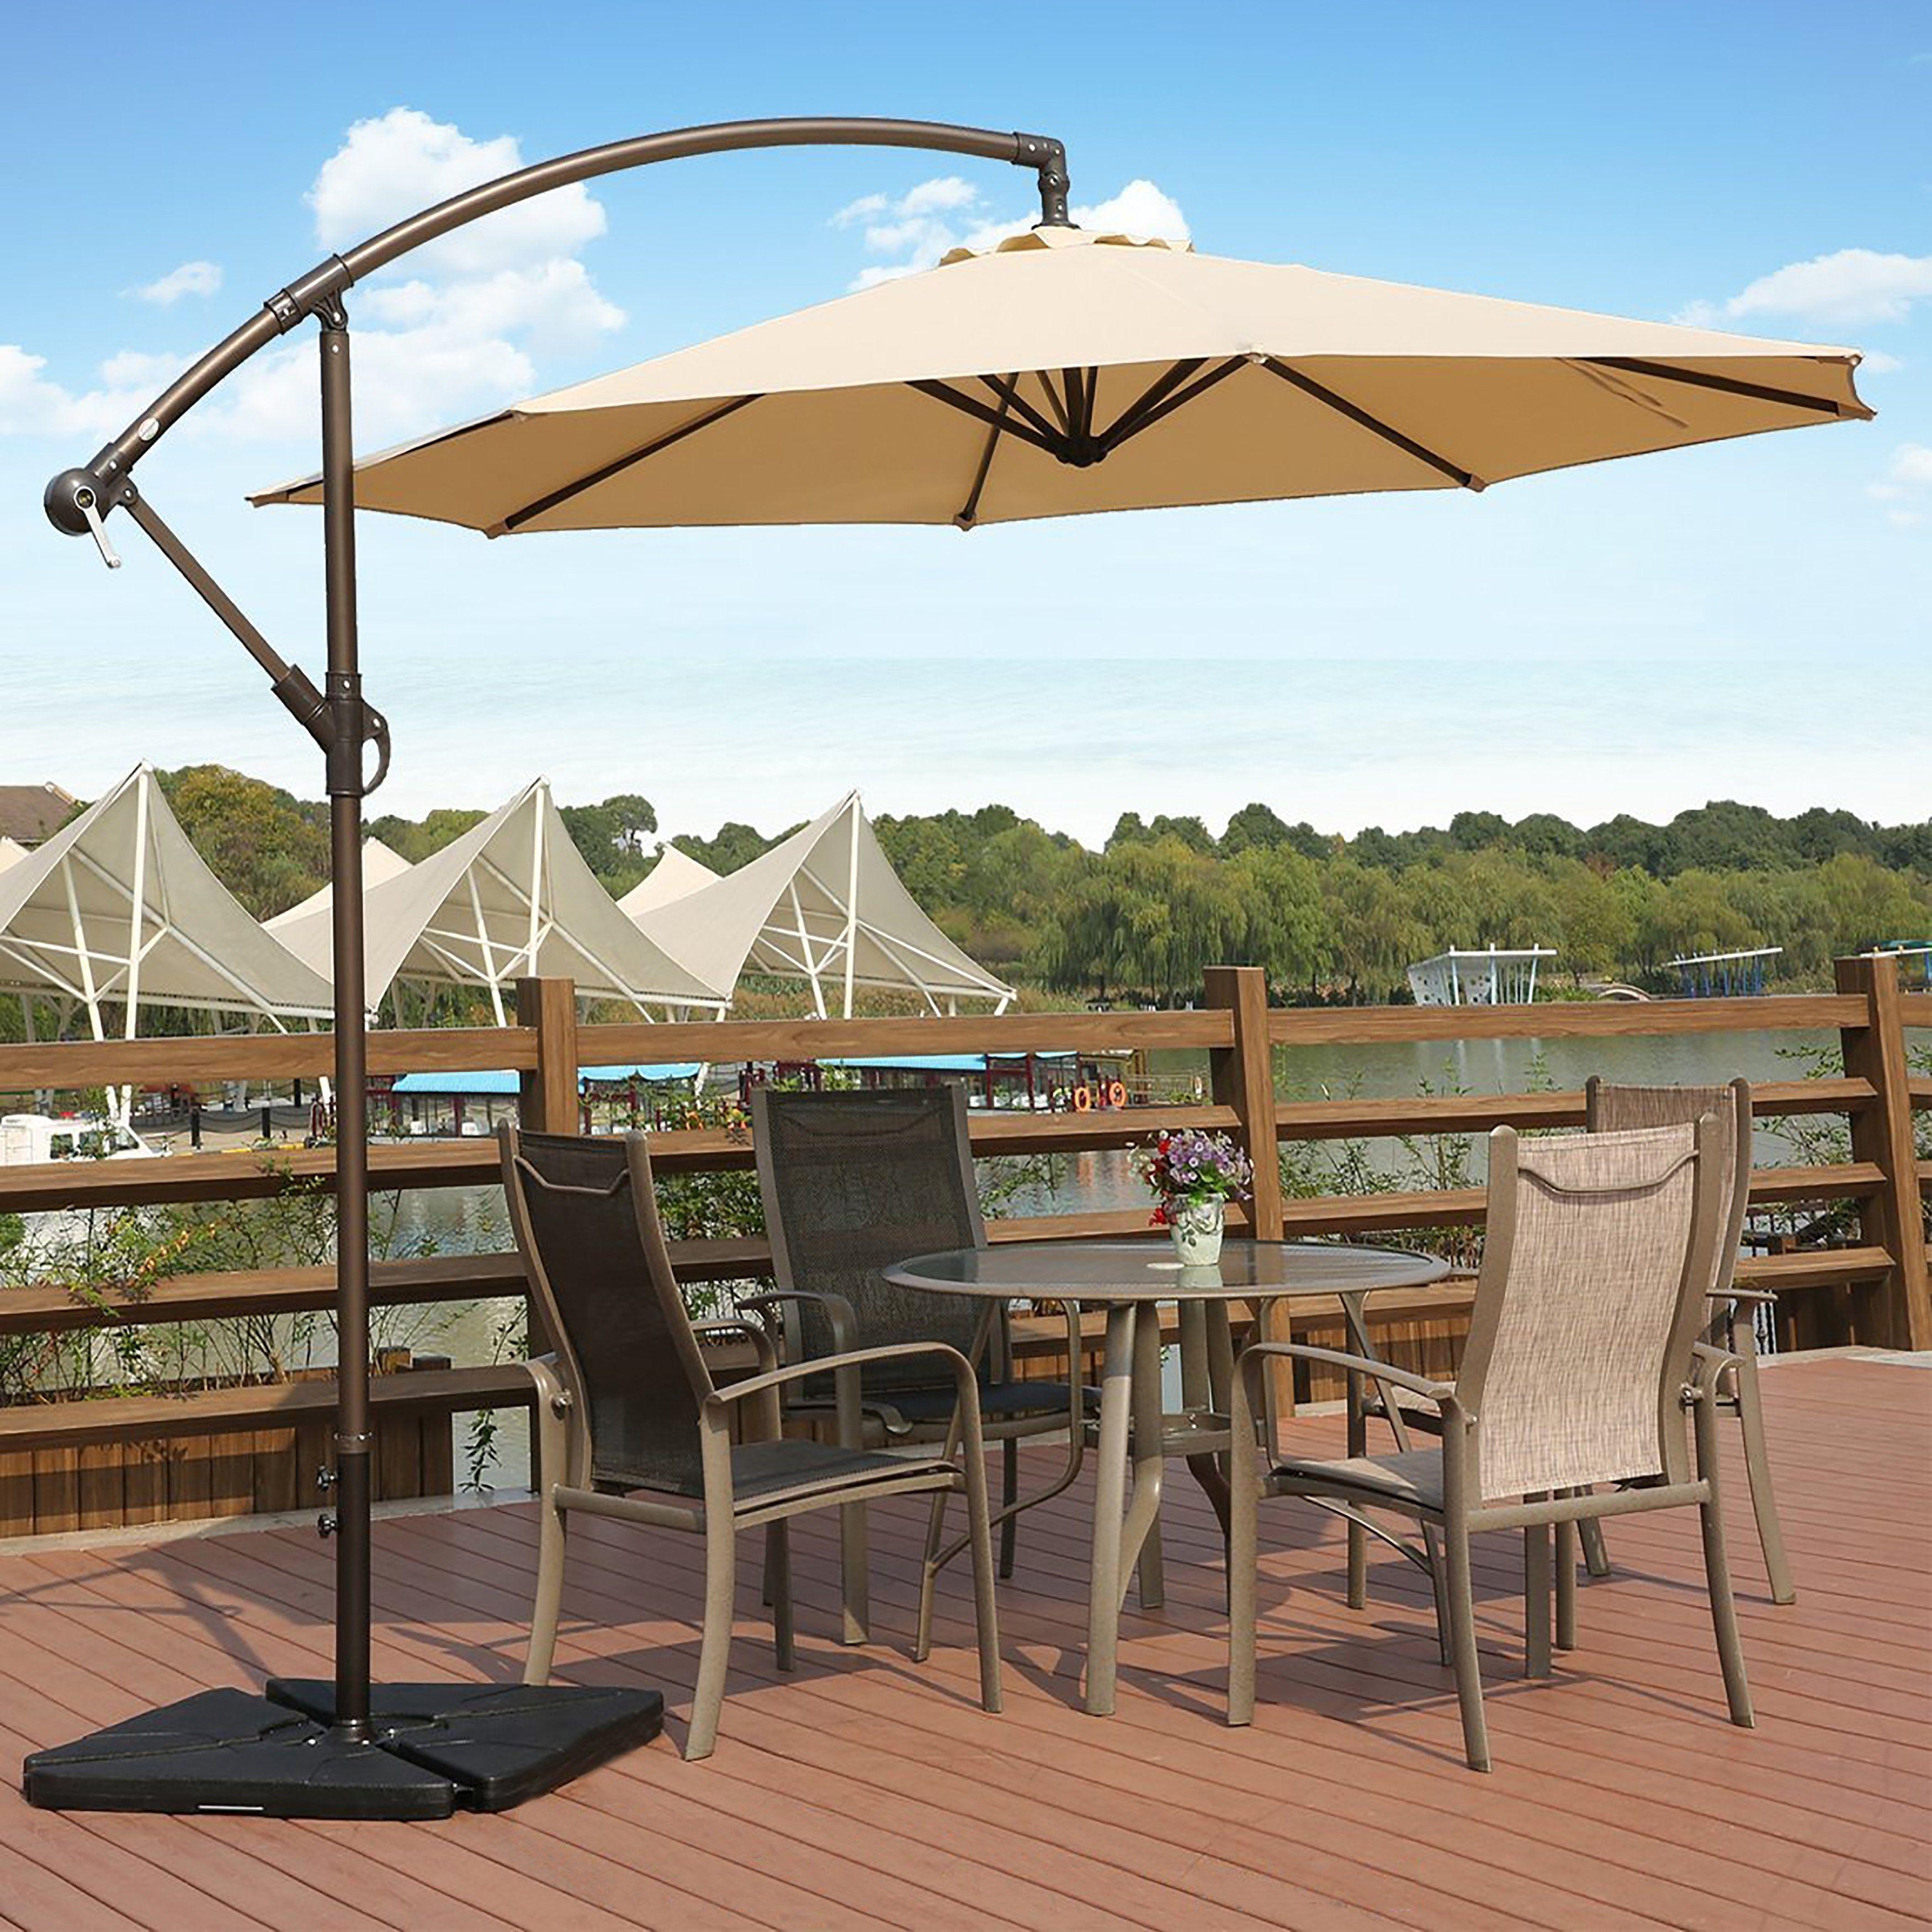 Stylish And Convenient Cantilever Patio Umbrella Best Patio Umbrella Patio Umbrellas Outdoor Patio Umbrellas